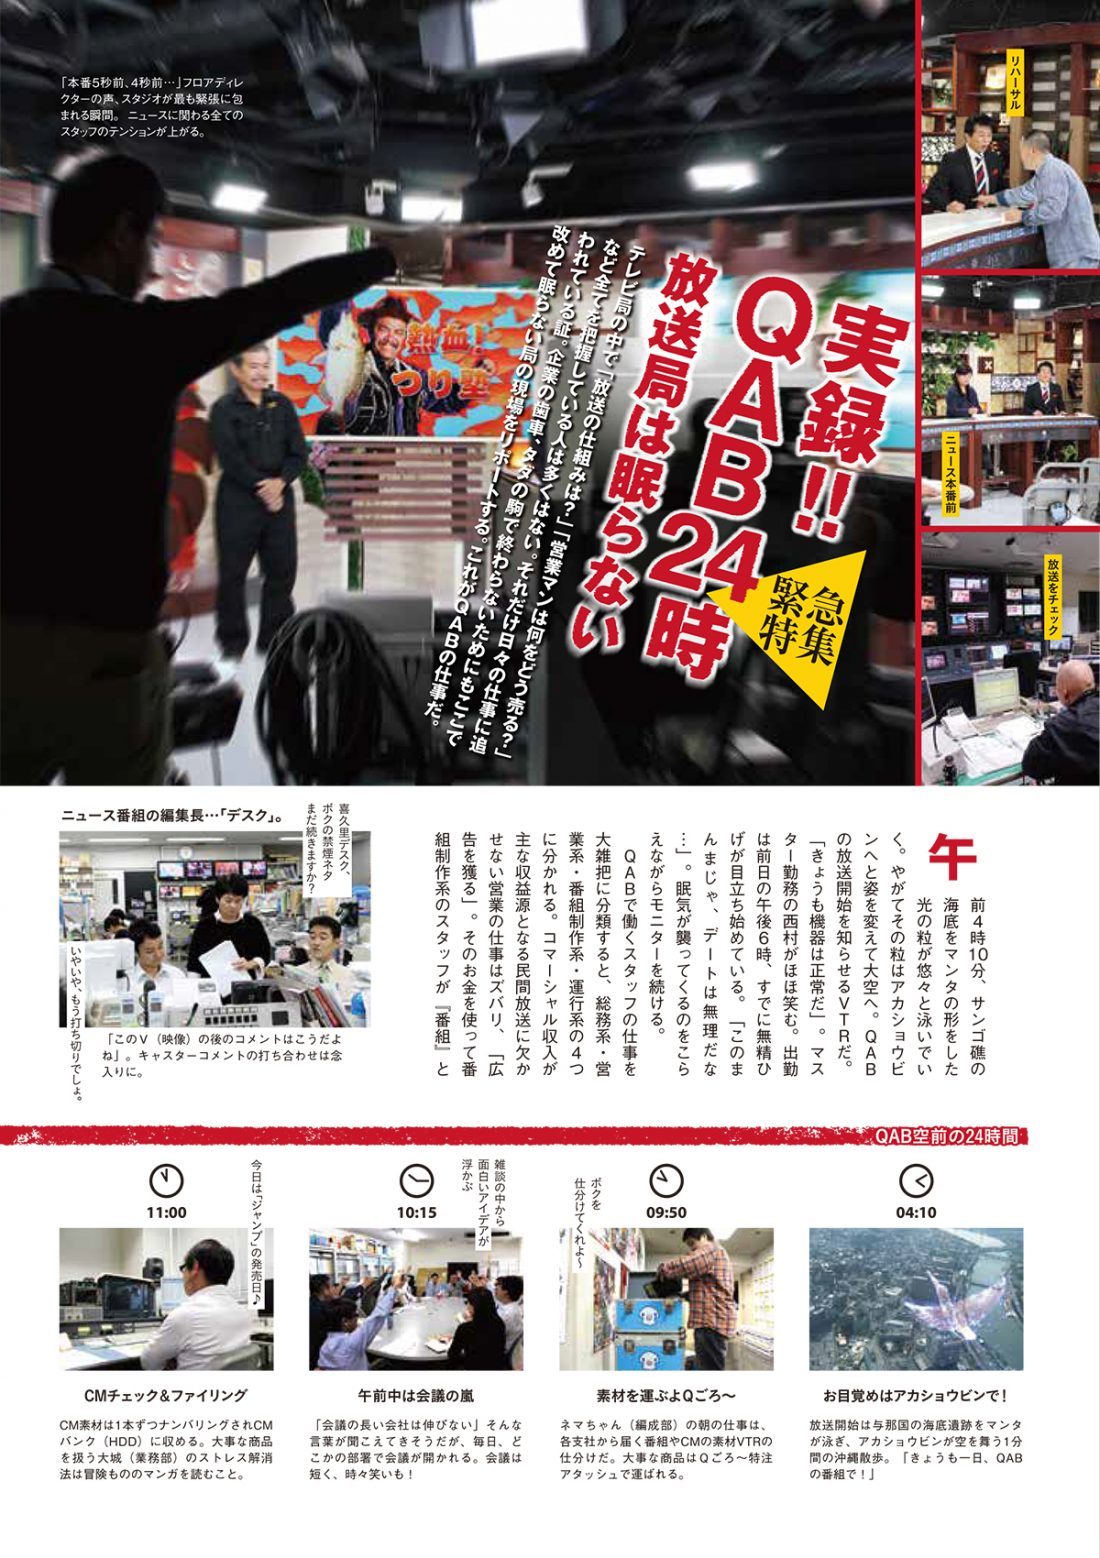 http://www.qab.co.jp/qgoro/wp-content/uploads/quun_0102-1100x1558.jpg